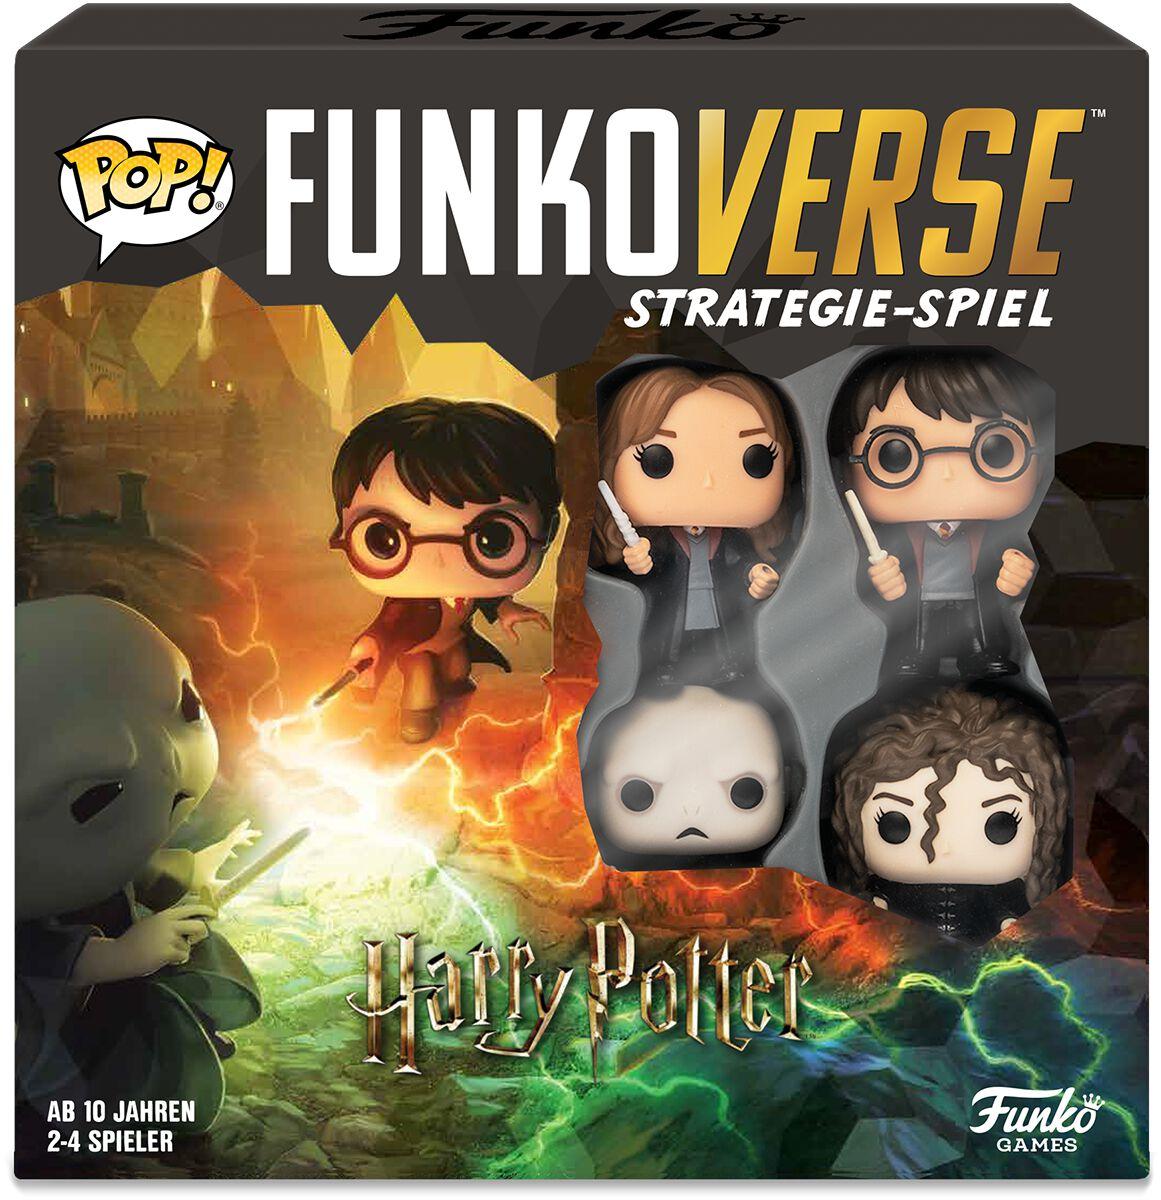 Image of Harry Potter Funkoverse 100 Deutsche Version Brettspiel Standard